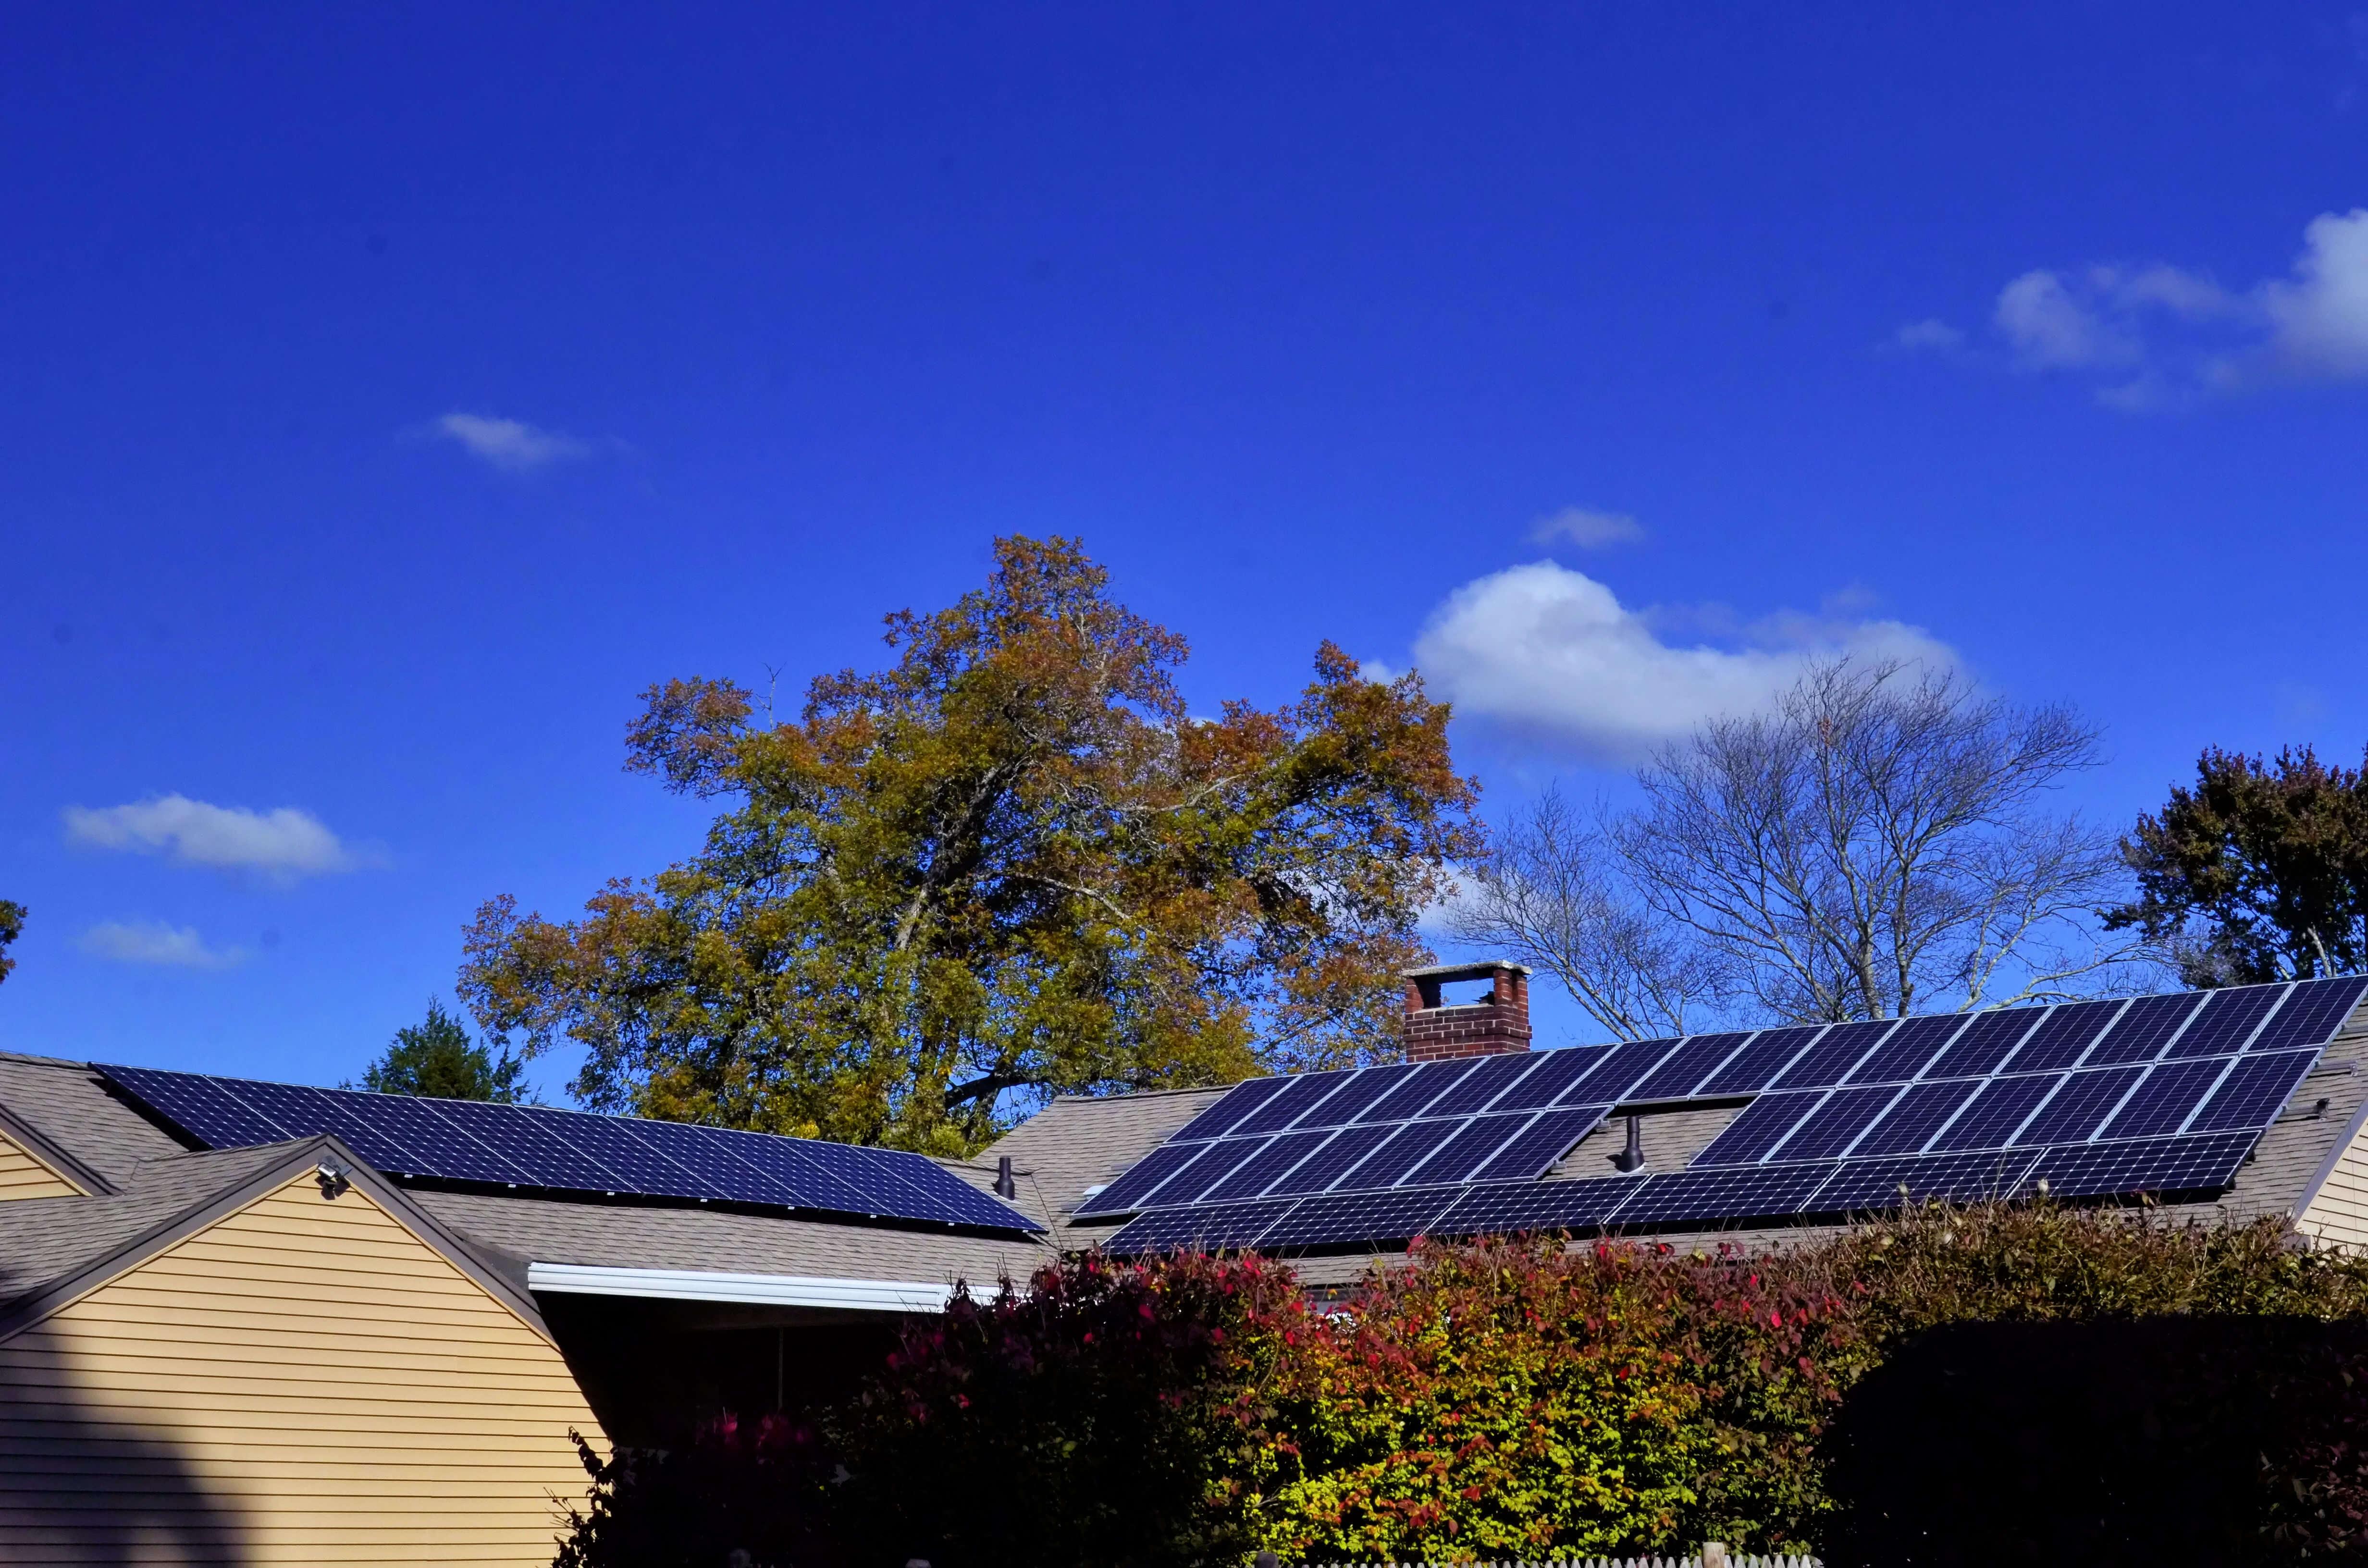 brockton massachusetts greater boston solar installation my generation energy